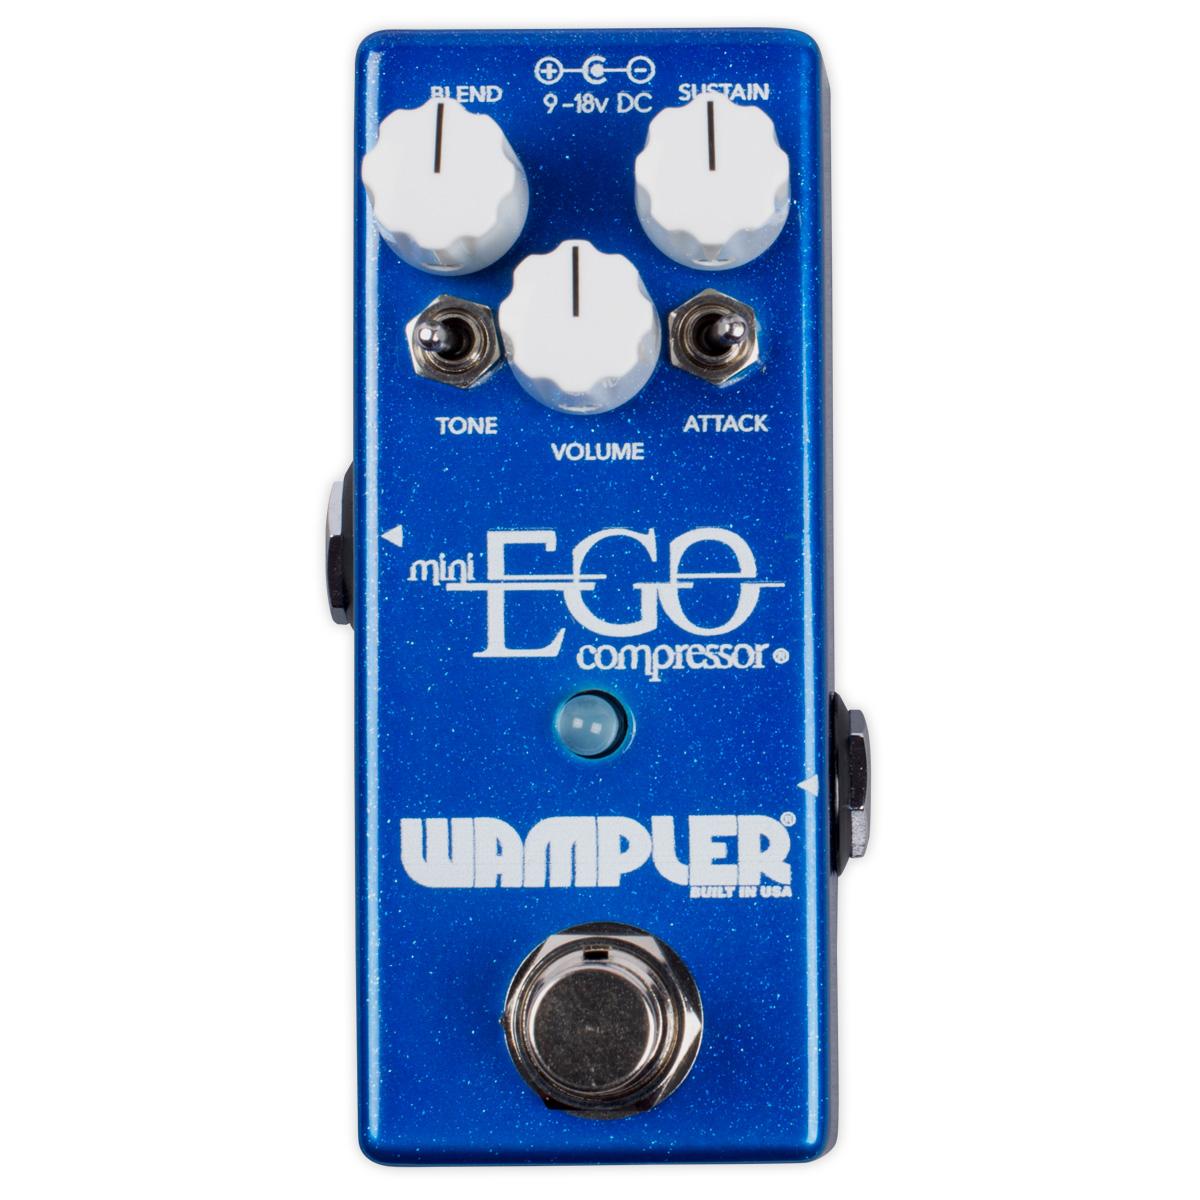 Wampler Pedals Mini Ego Compressor 新品 [ワンプラー][ミニエゴ][コンプレッサー][Effector,エフェクター]